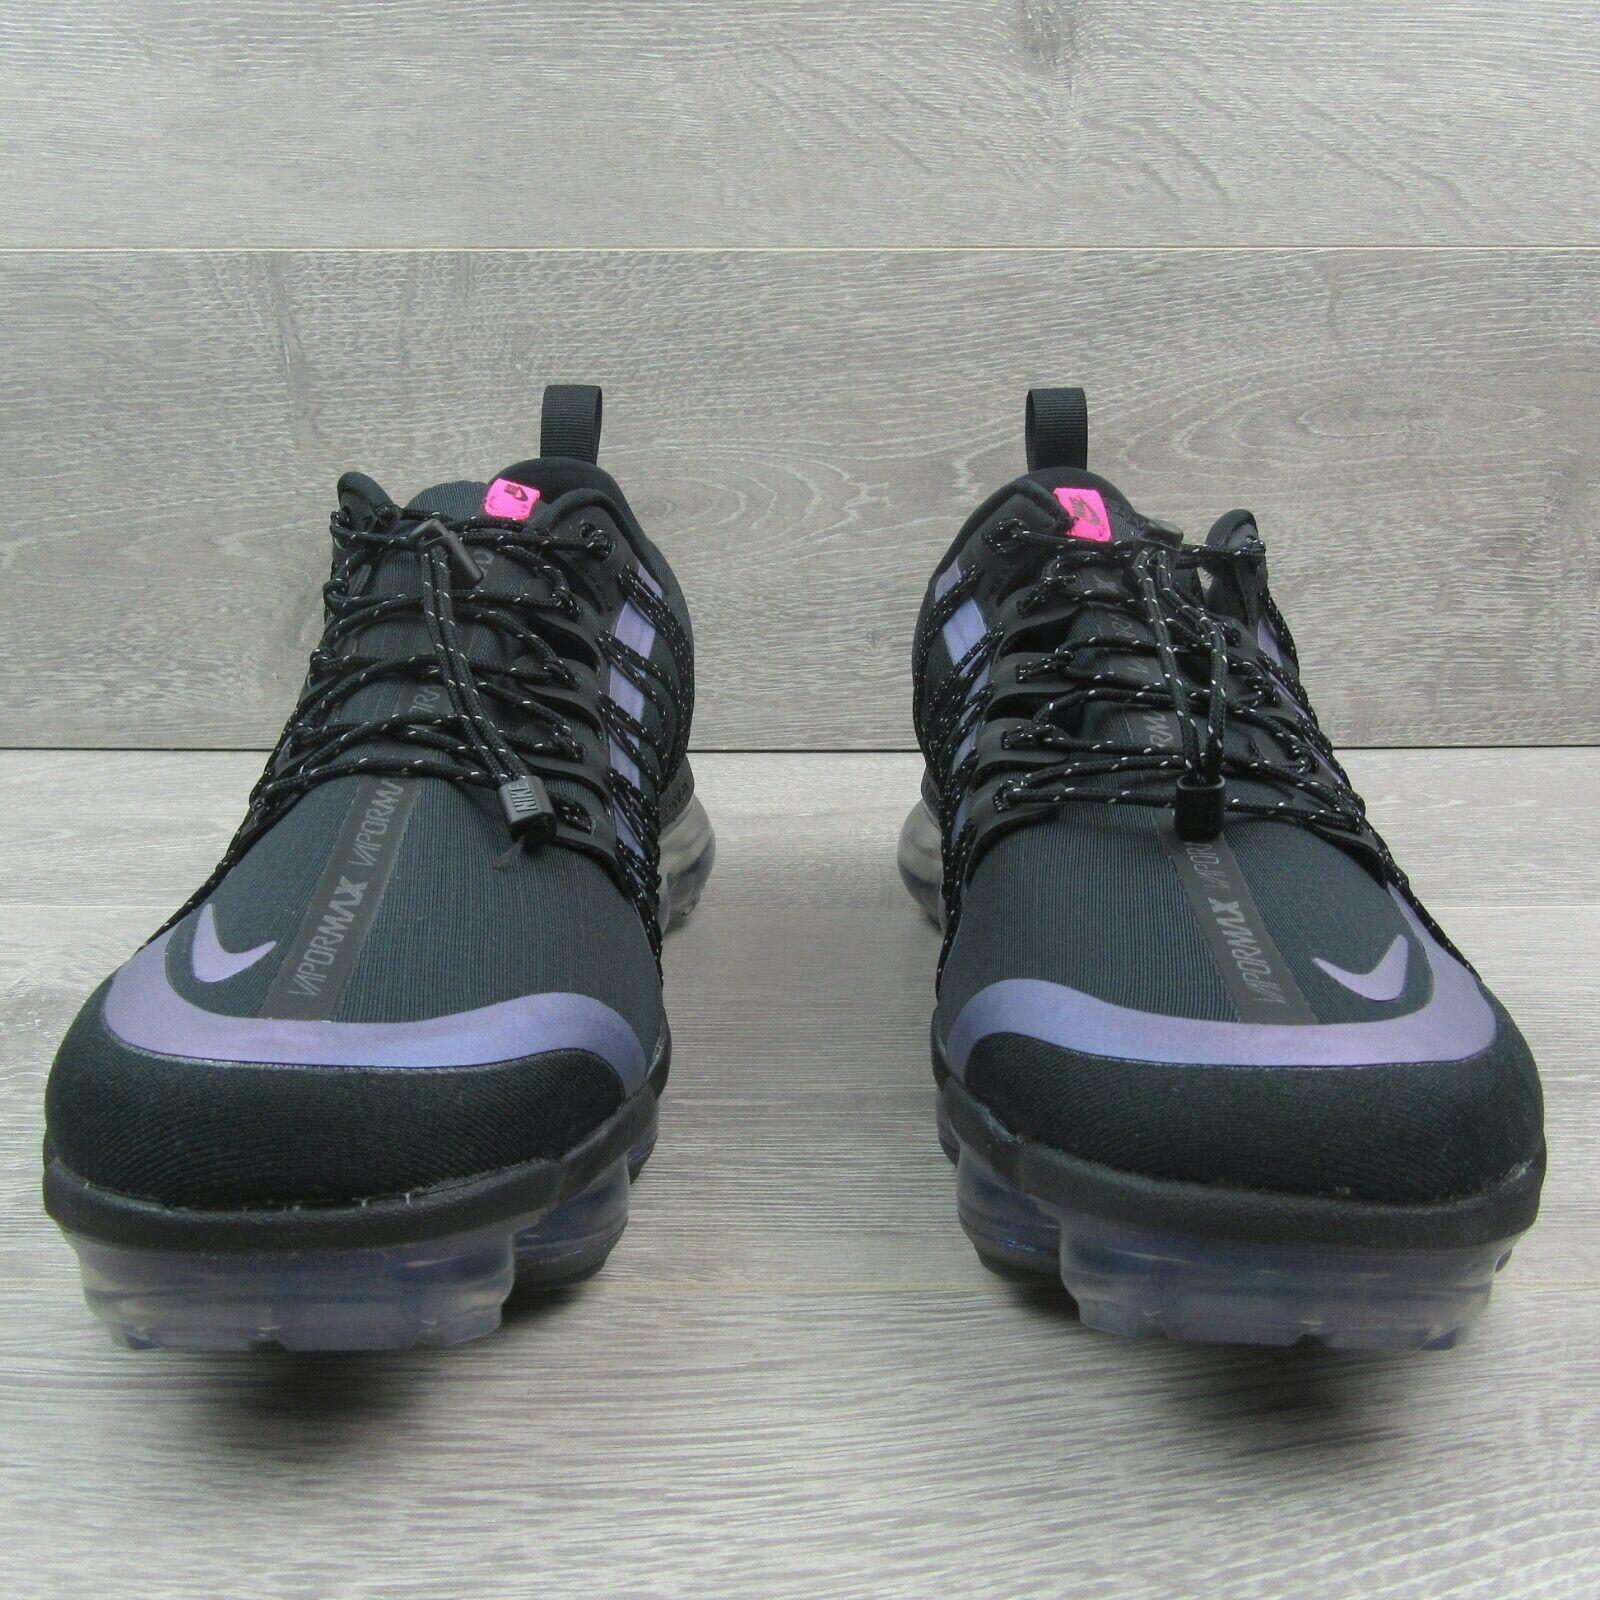 Nike Air VaporMax Run Utility Throwback Black Size 10 Running Shoes AQ8810-009